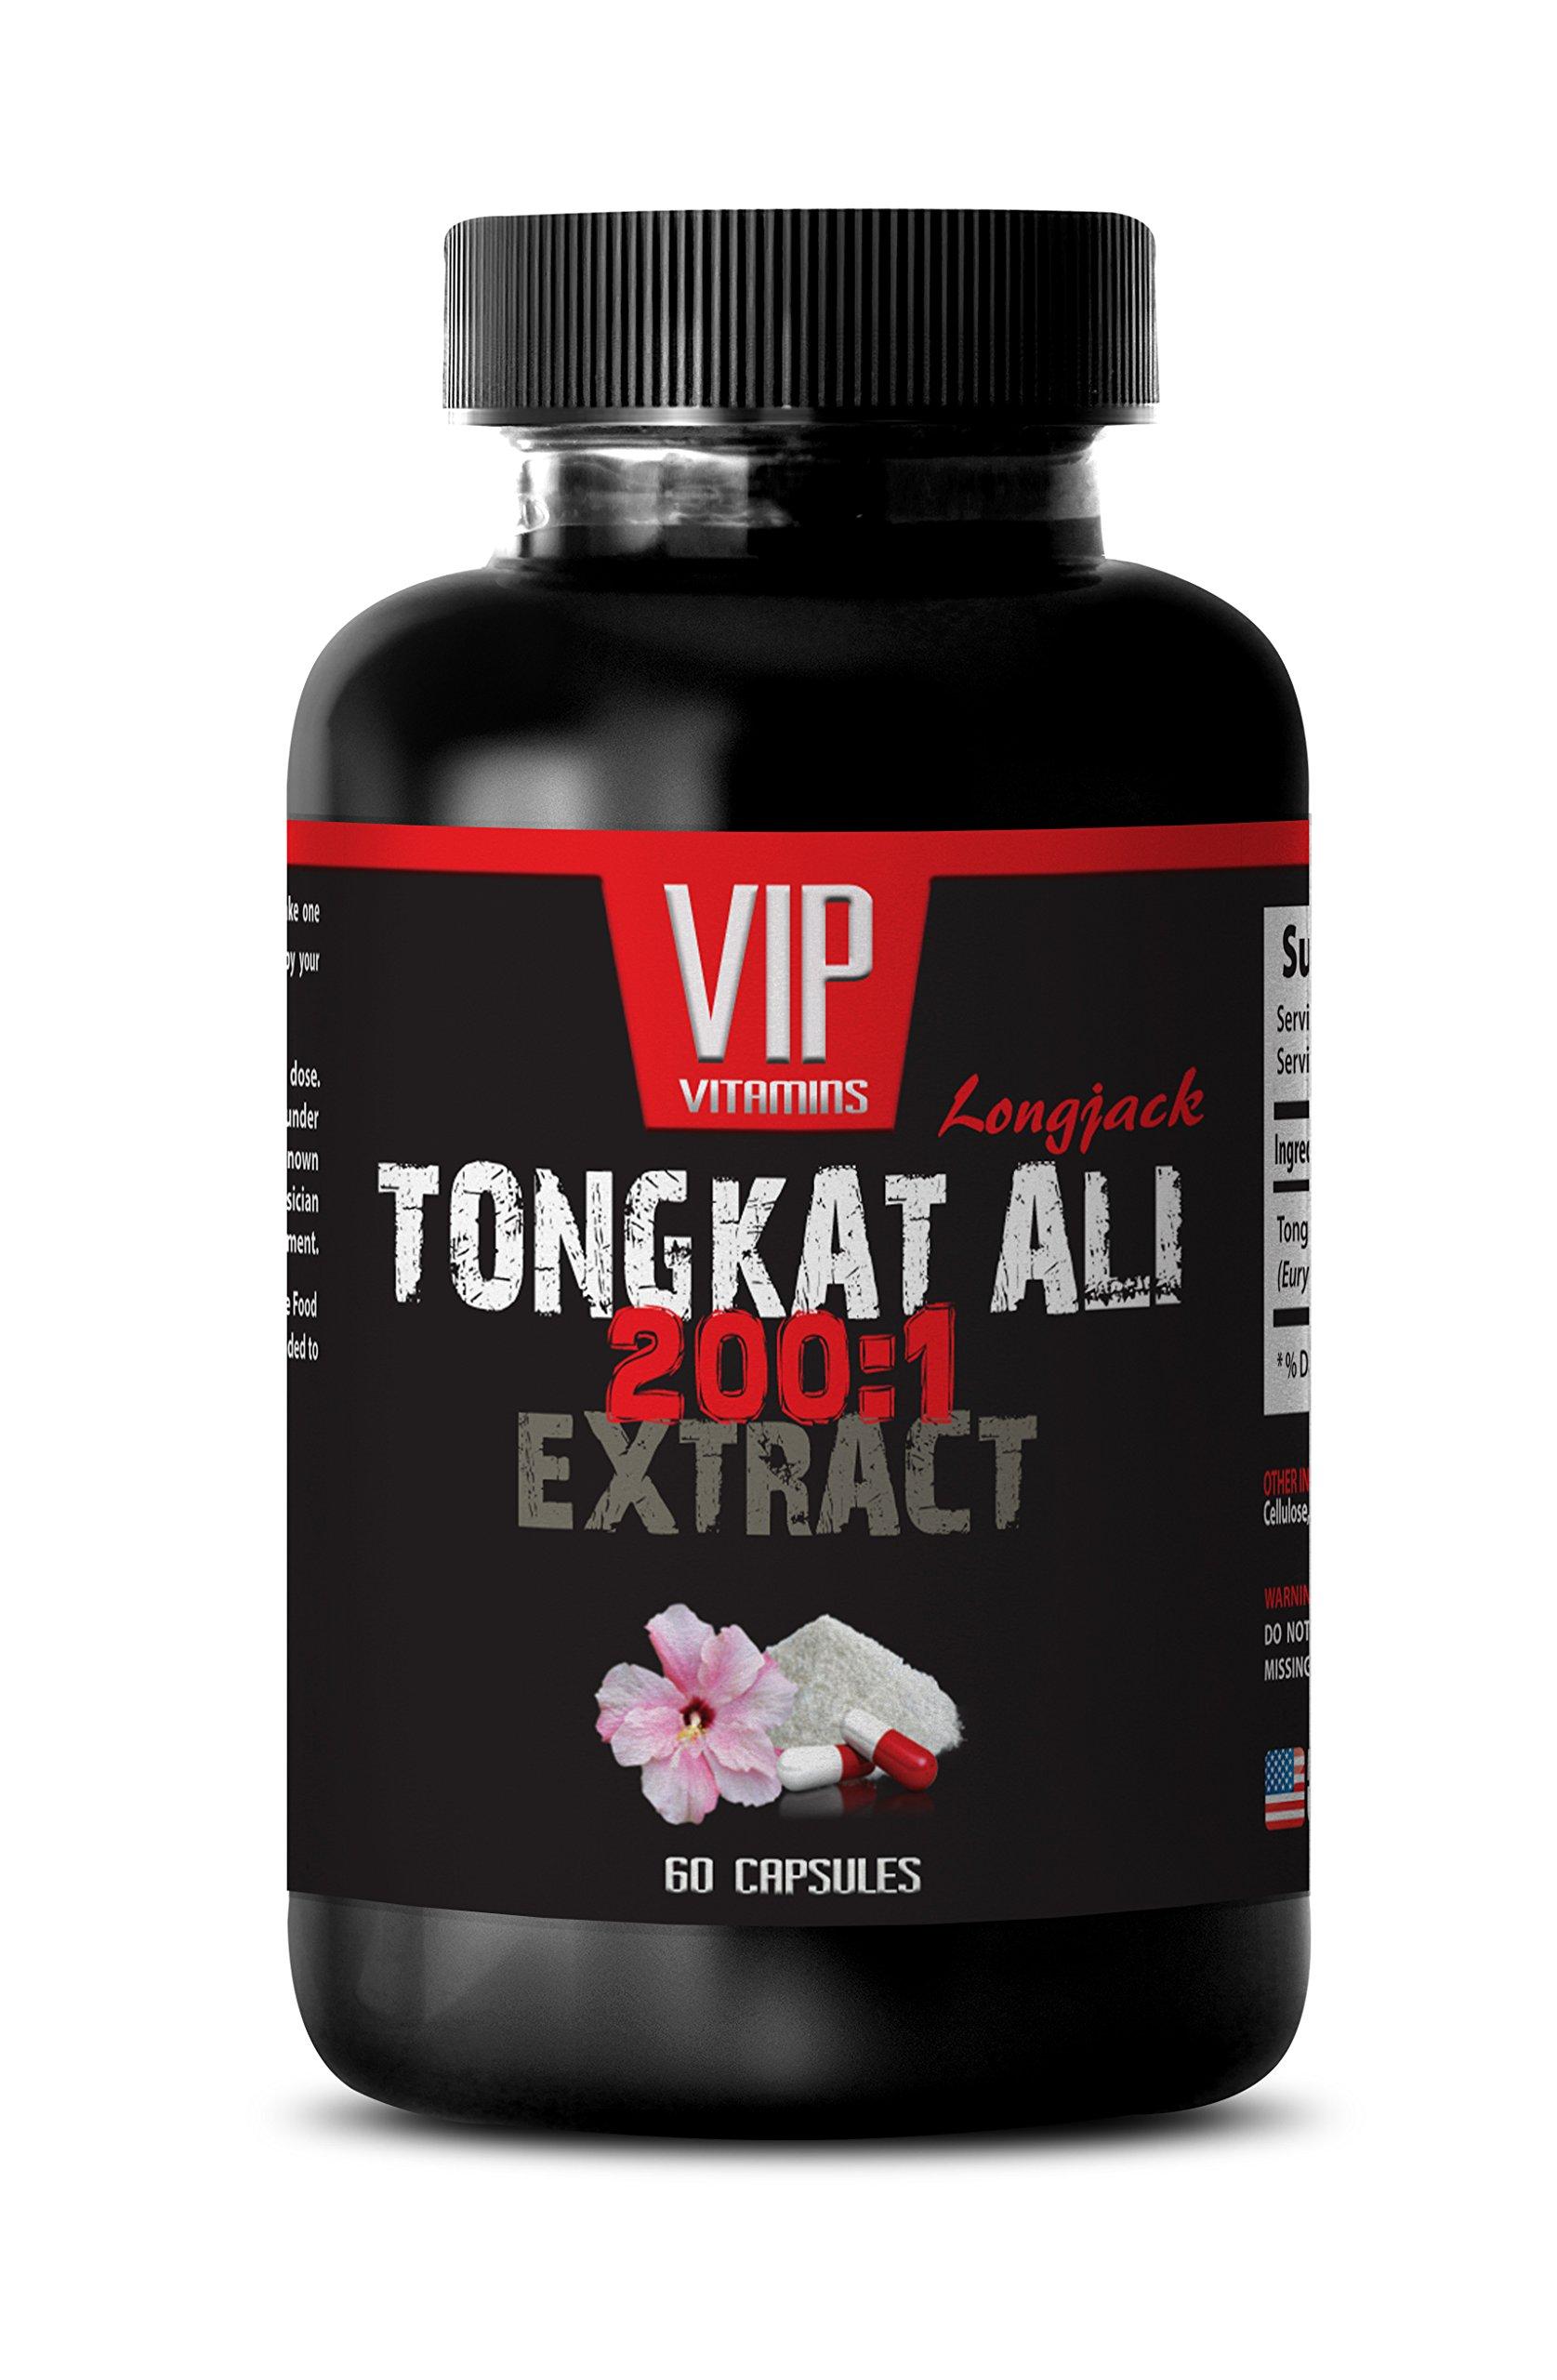 Sexual desire enhancer - TONGKAT ALI 200: 1 400 MG EXTRACT - Tongkat Ali Extract Powder - 1 Bottle 60 Capsules